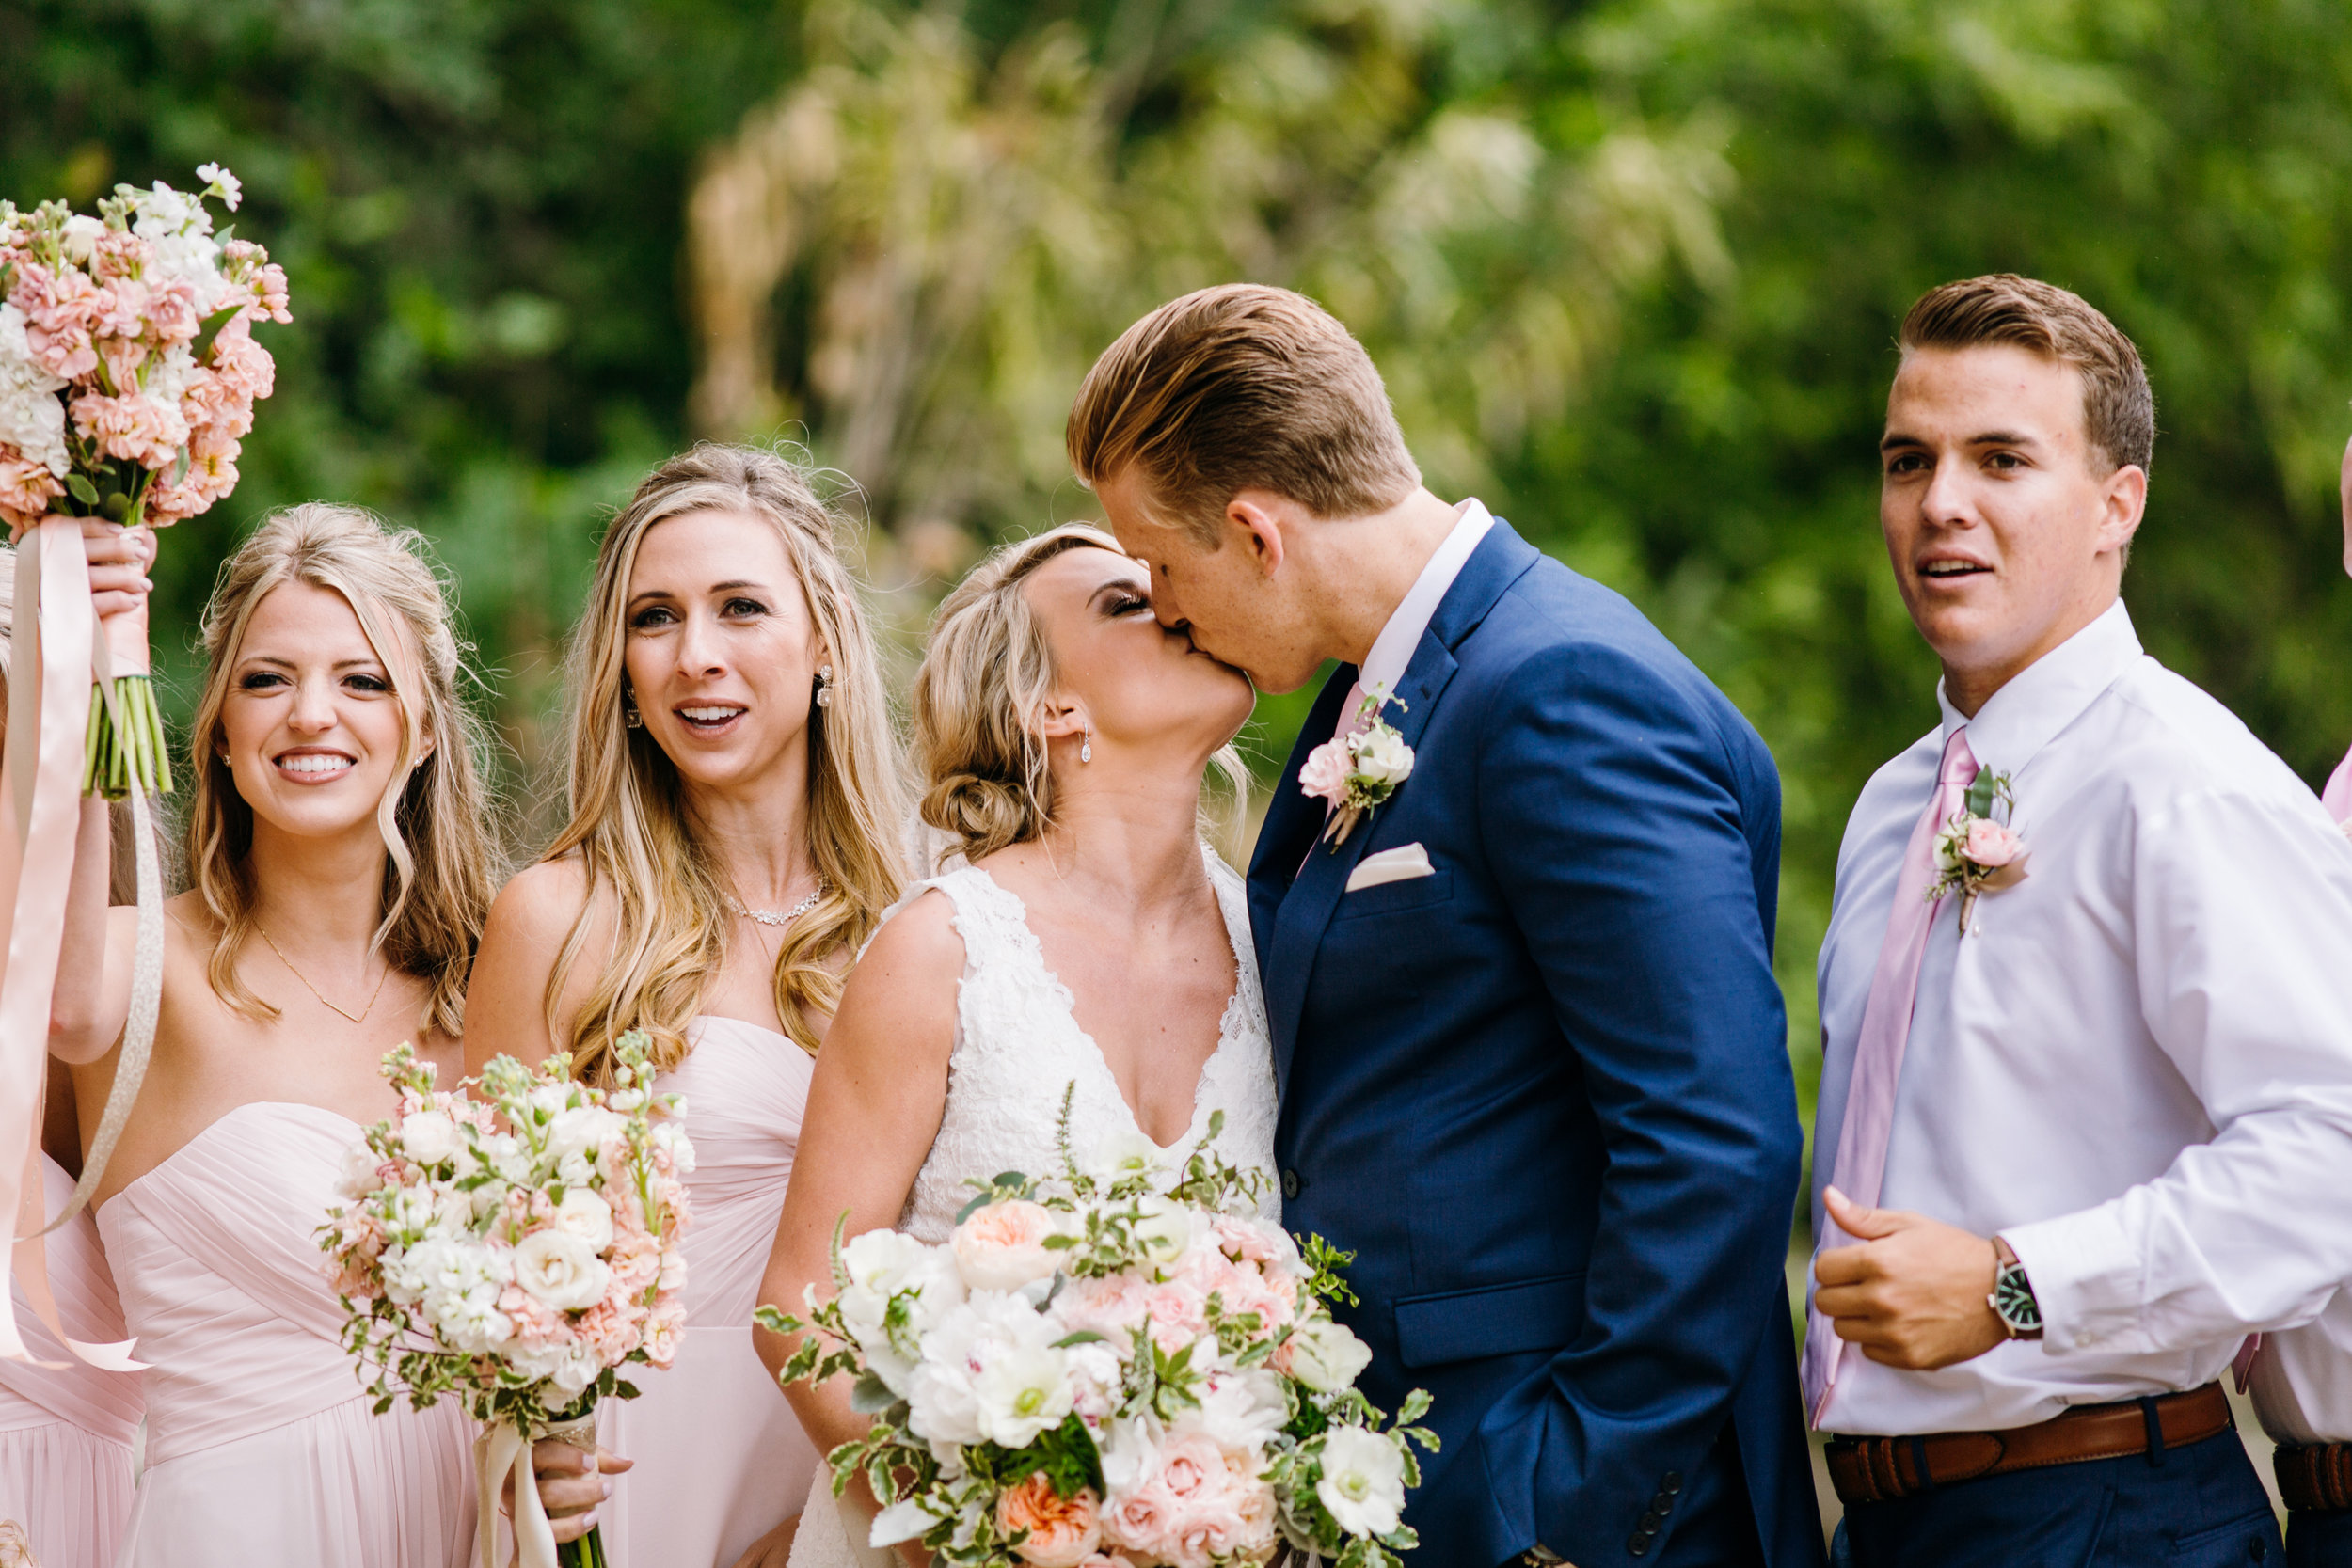 KaraNixonWeddings-LakeOakMeadows-Temecula-Wedding-22.jpg